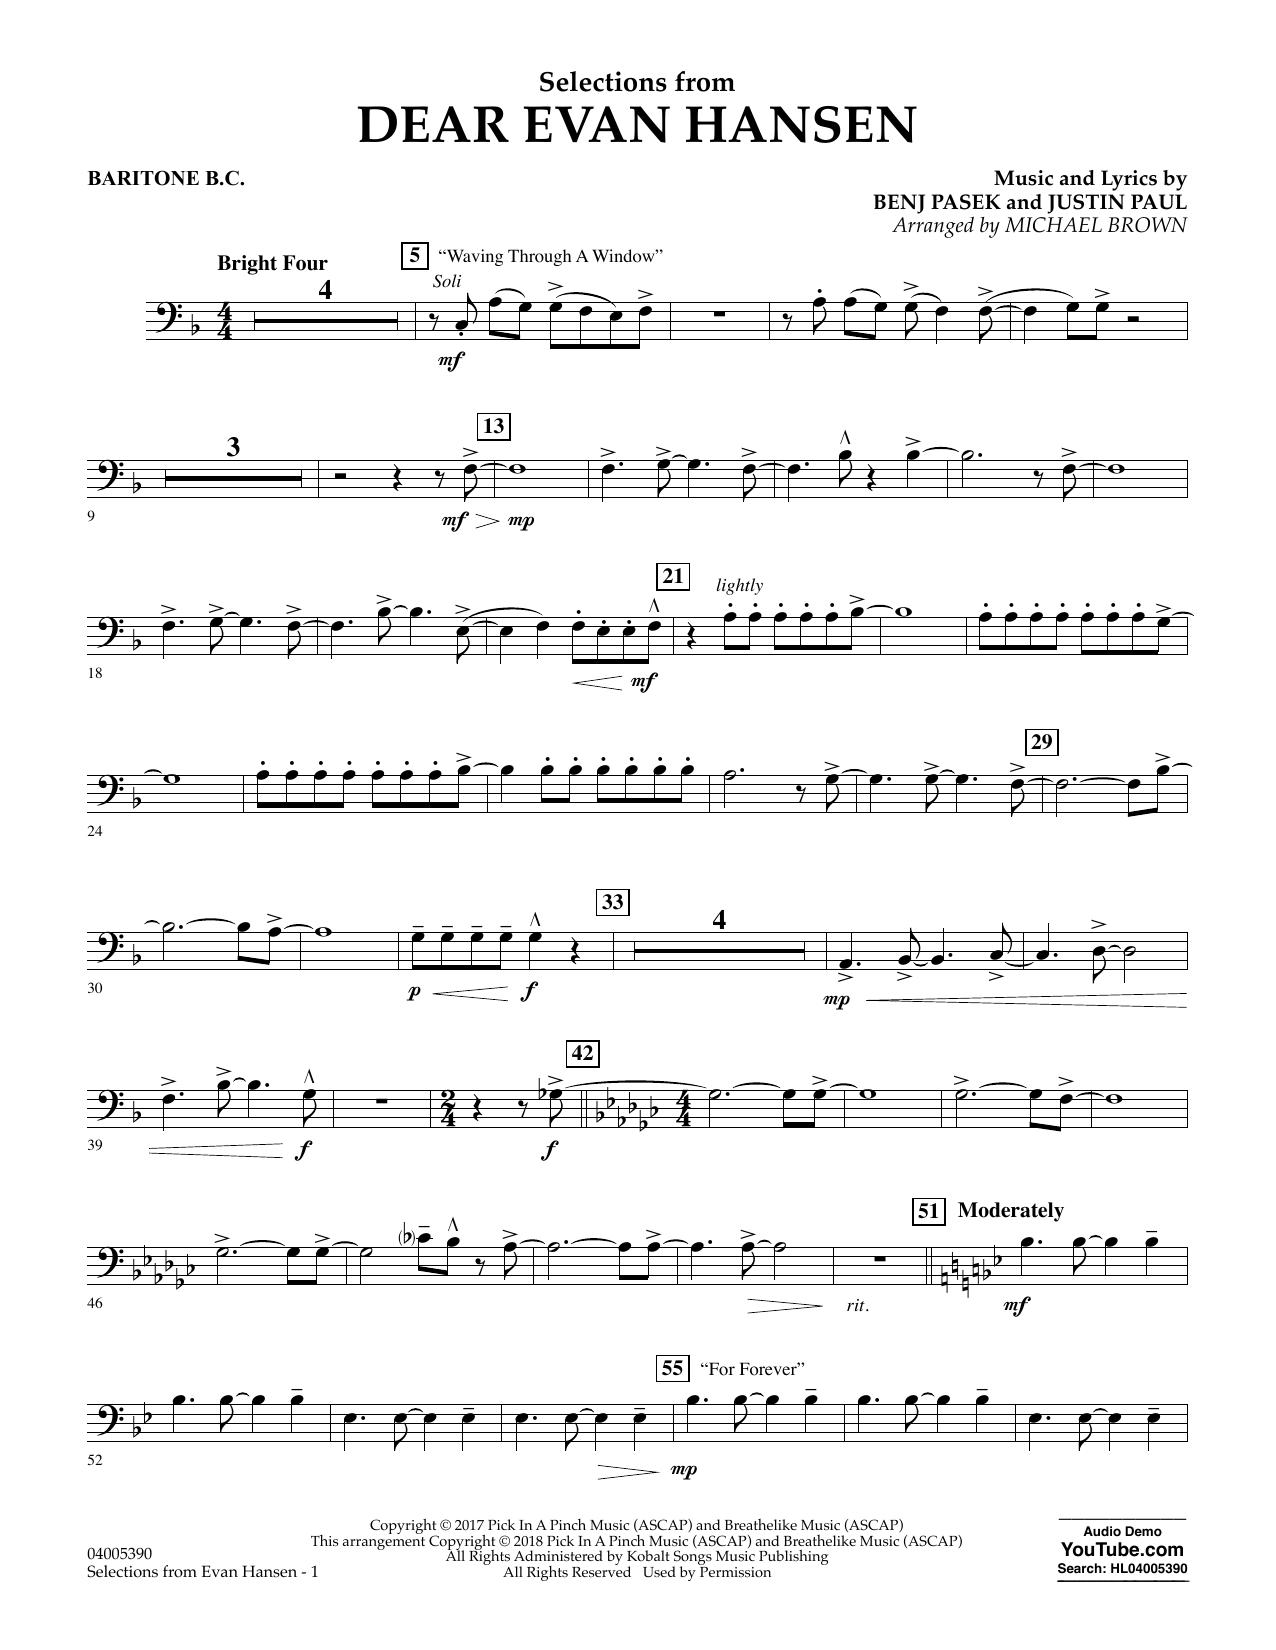 Selections from Dear Evan Hansen - Baritone B.C. (Concert Band)